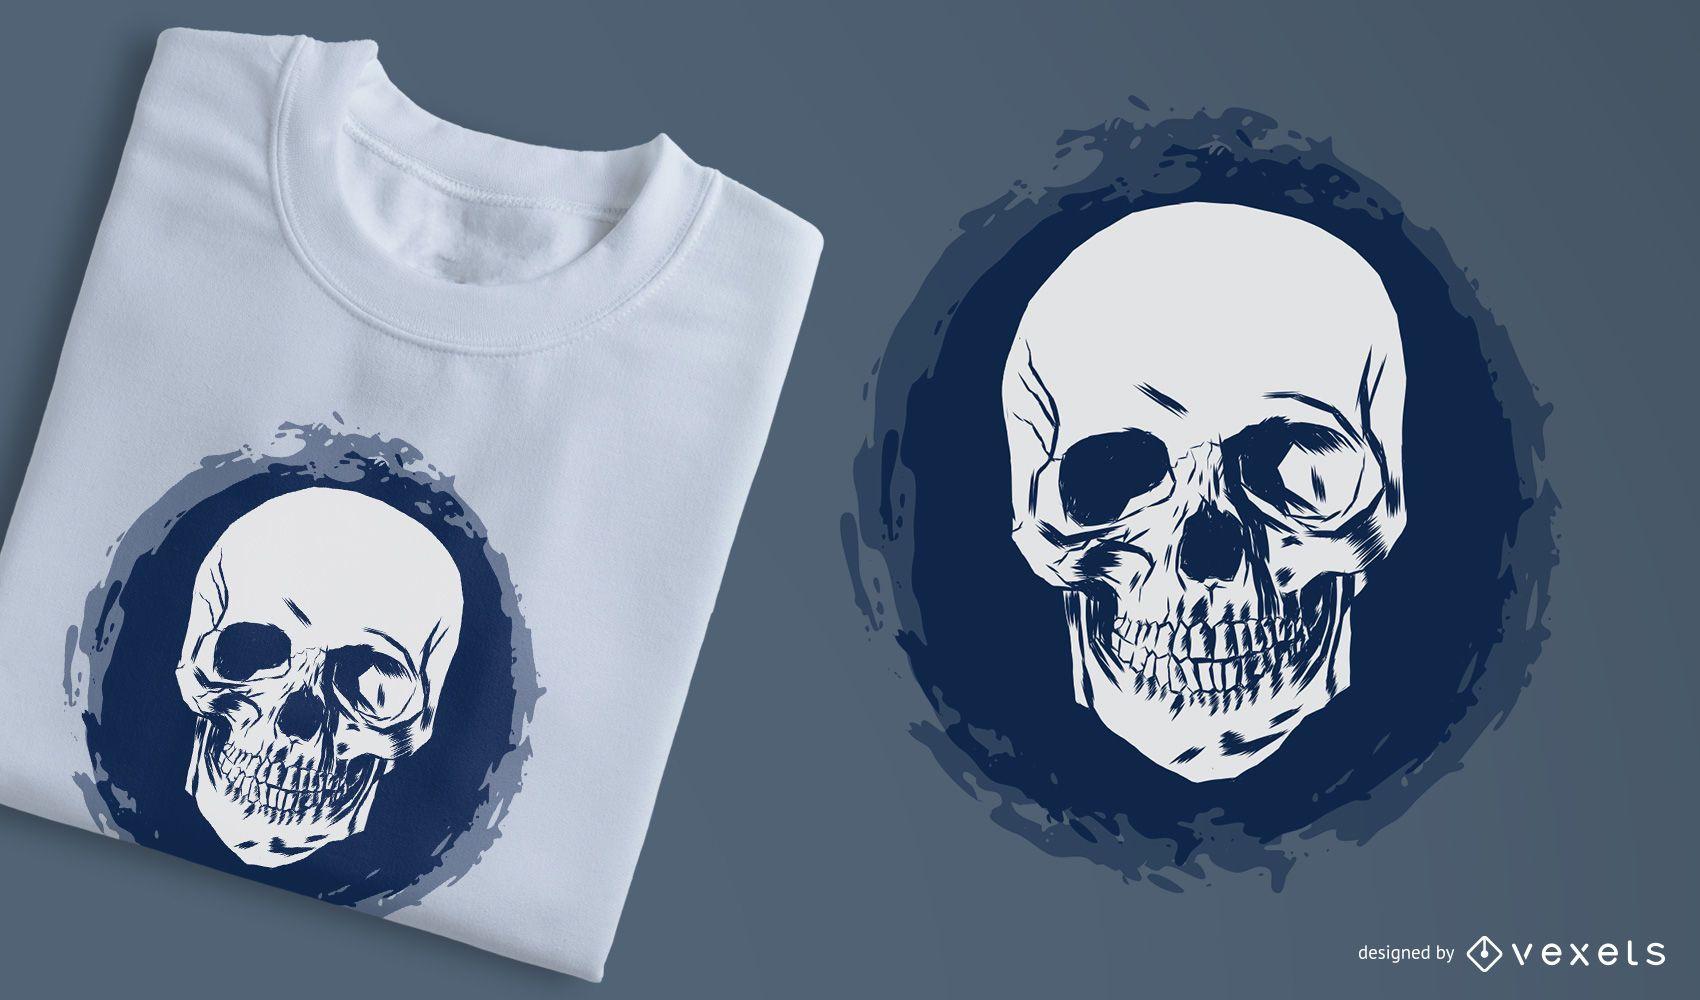 Camiseta Sketchy 3 Faces Skull